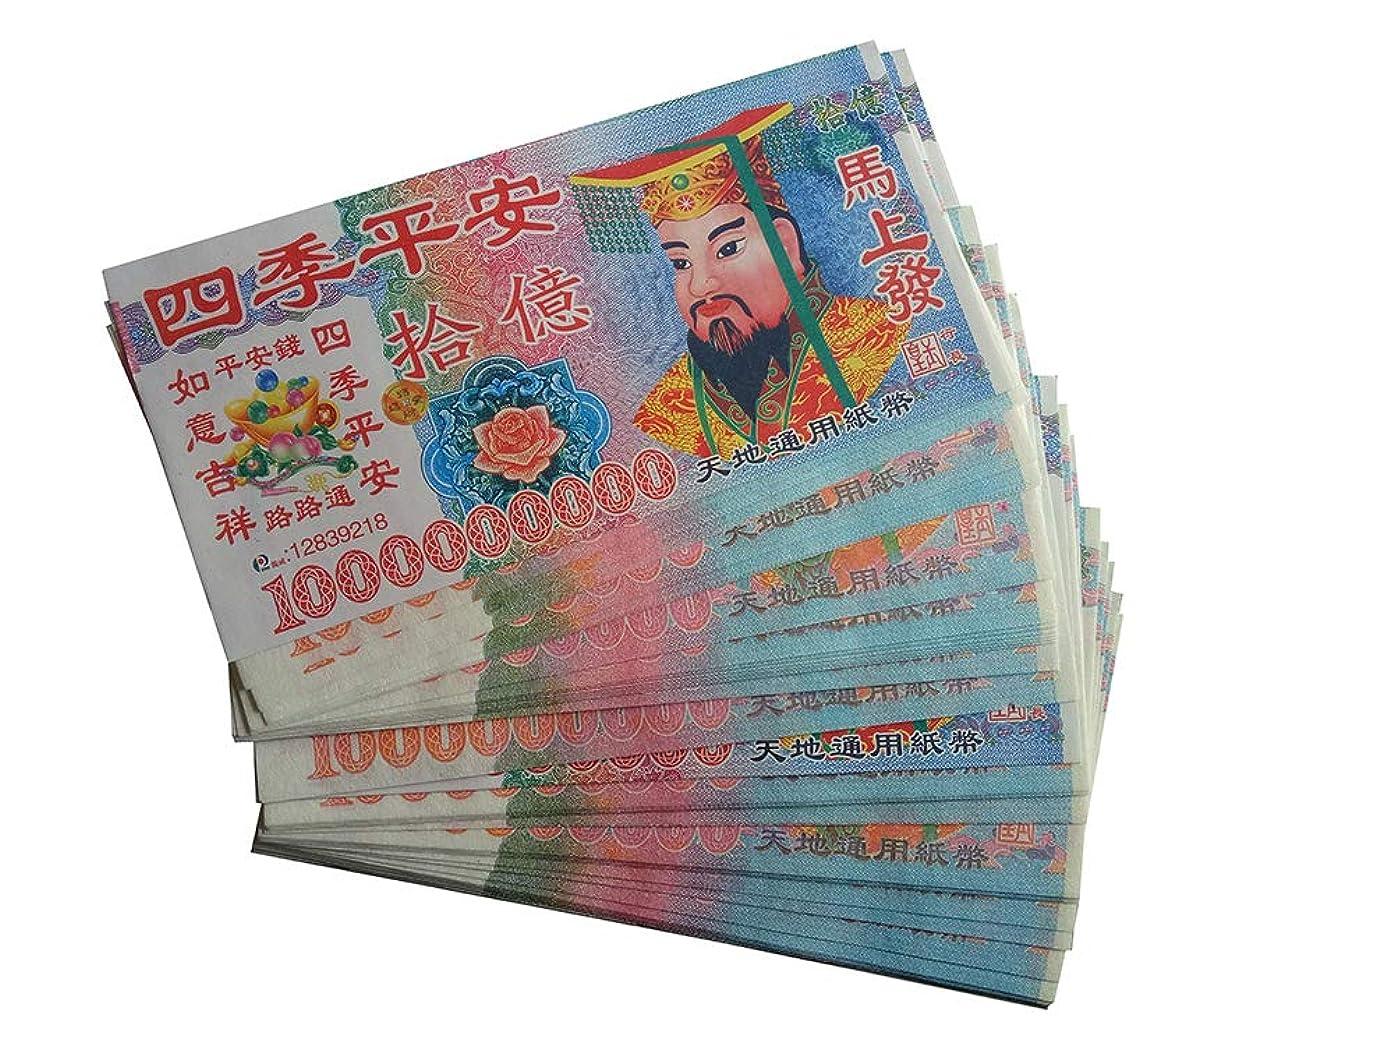 Chinese Joss Paper Money - Ancestor Money Joss Paper - Ancestor Money Jade Emperor - Heaven Bank Notes 1,000,000,000 - Siji Pingan (100 Pcs)